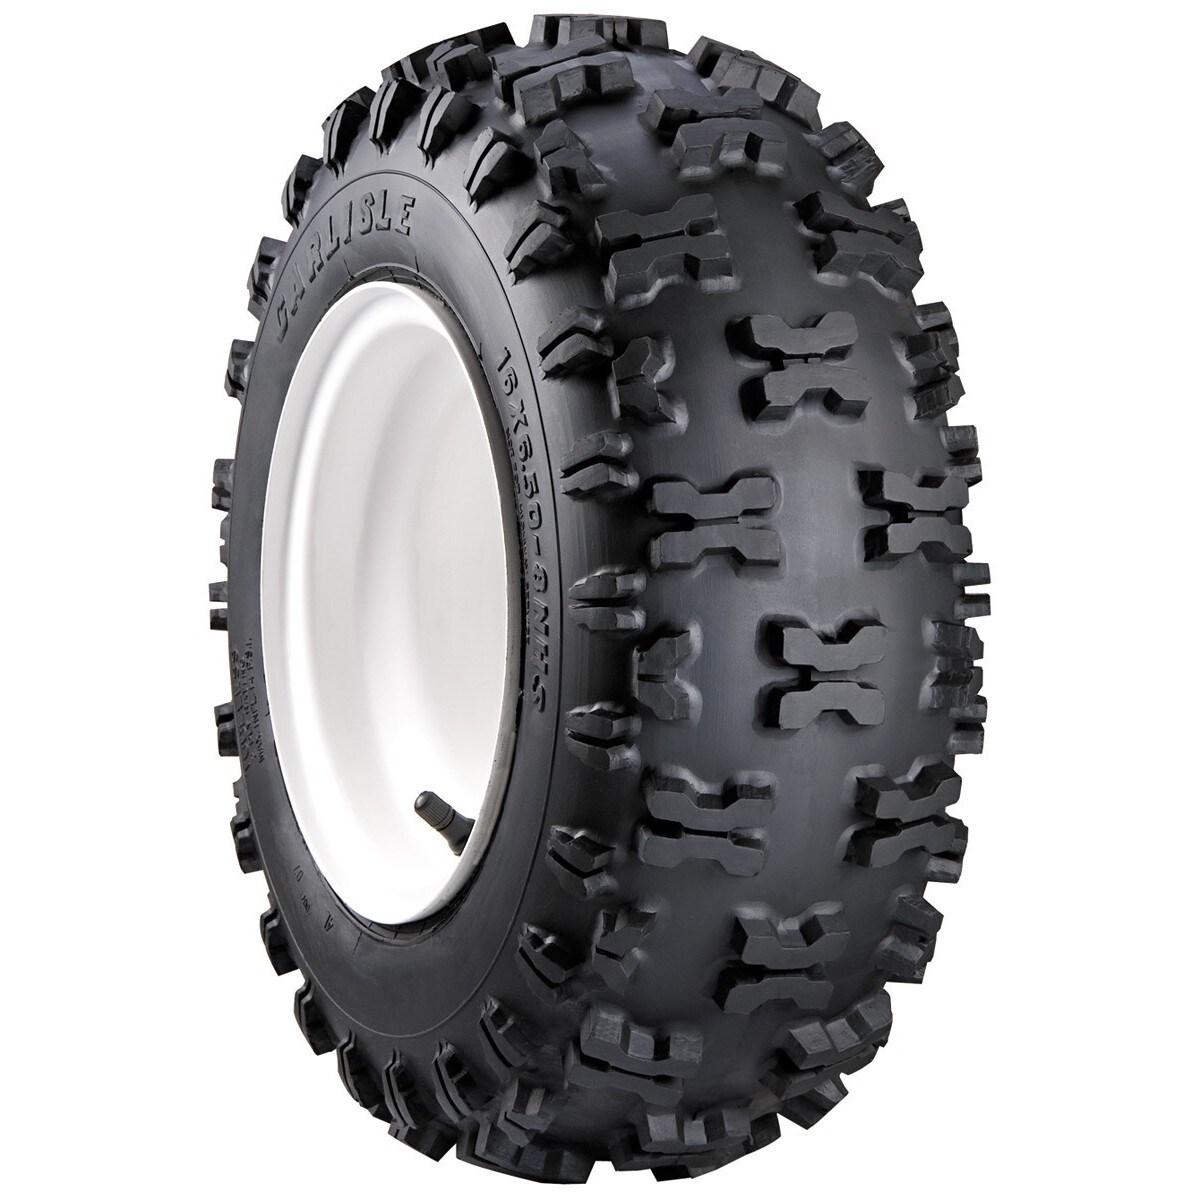 Carlisle Snow Hog Snow Thrower Tire - 410-6 LRA/2 ply (Bl...